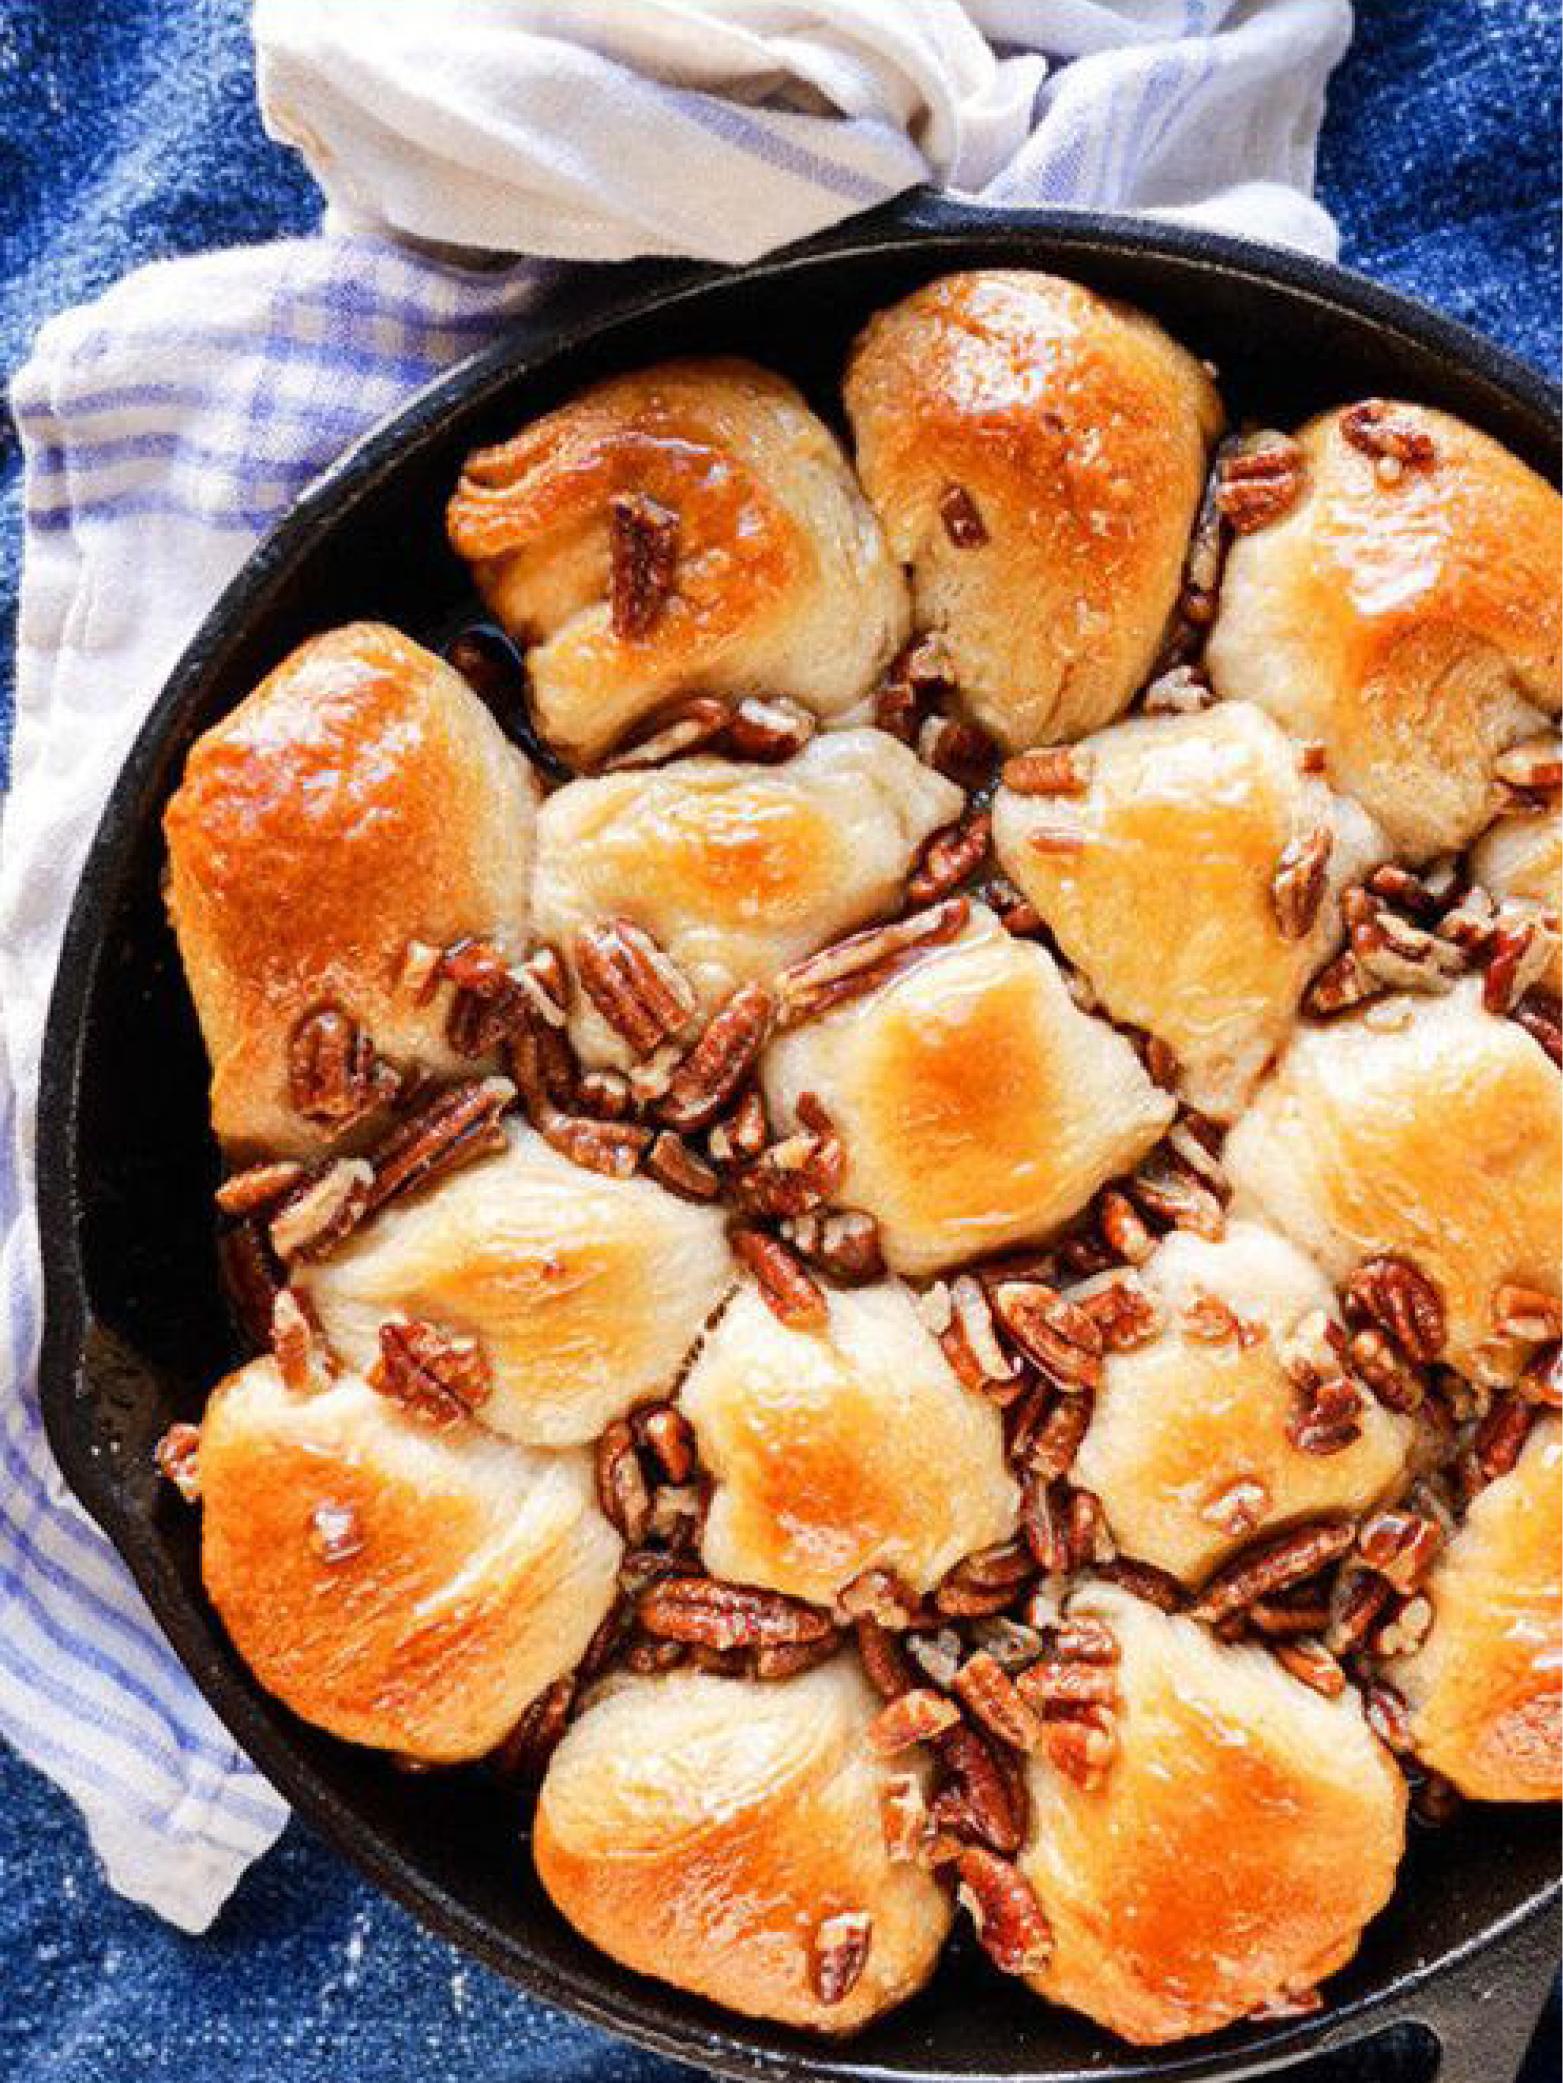 13 Insanely Easy Three-Ingredient Desserts  Buzzfeed